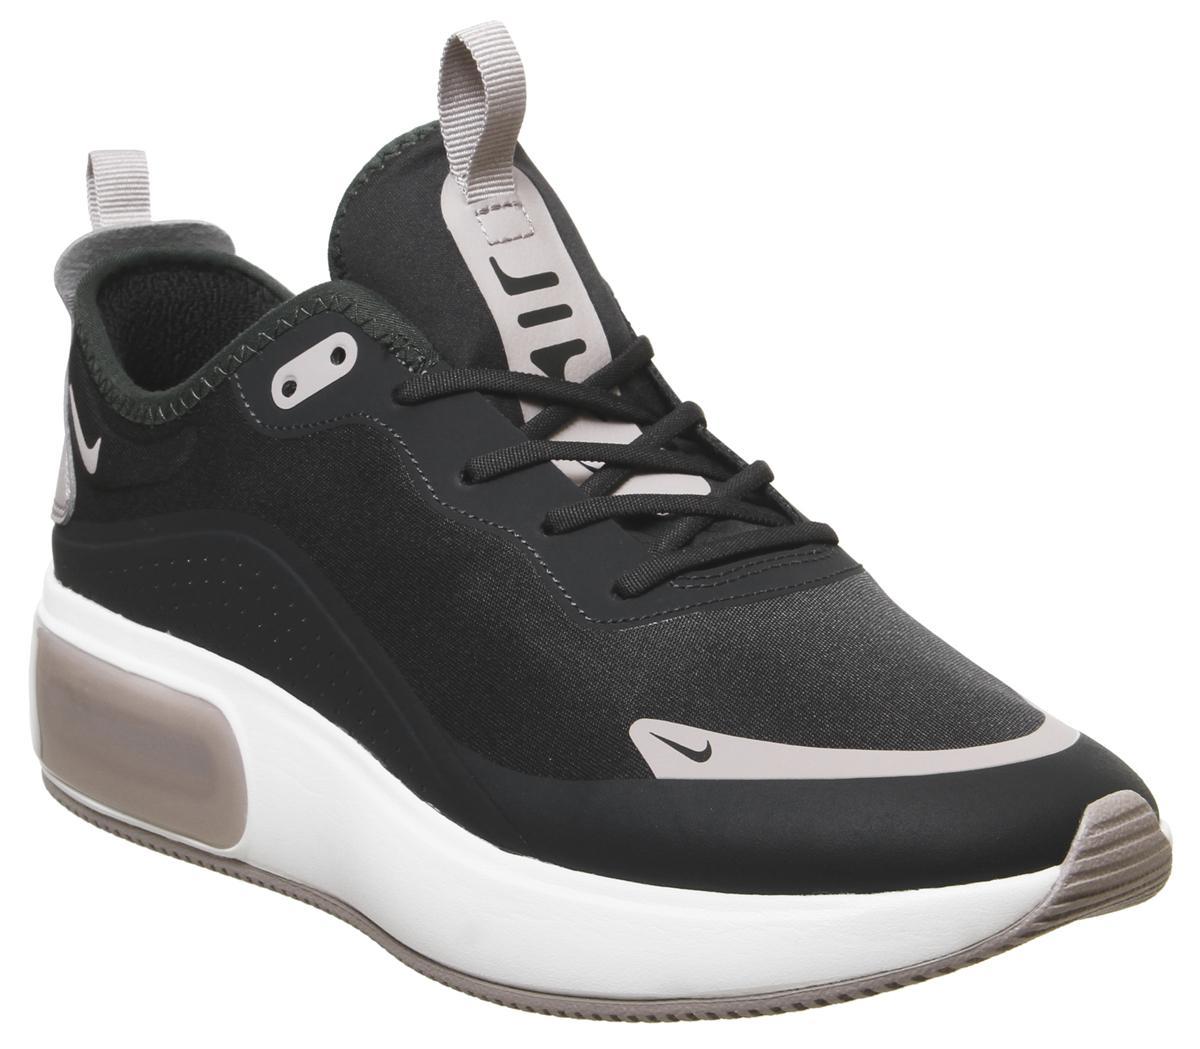 obtener online genuino mejor calificado tecnologías sofisticadas Nike Air Max Dia Trainers Off Noir Pumice Black Summit White ...